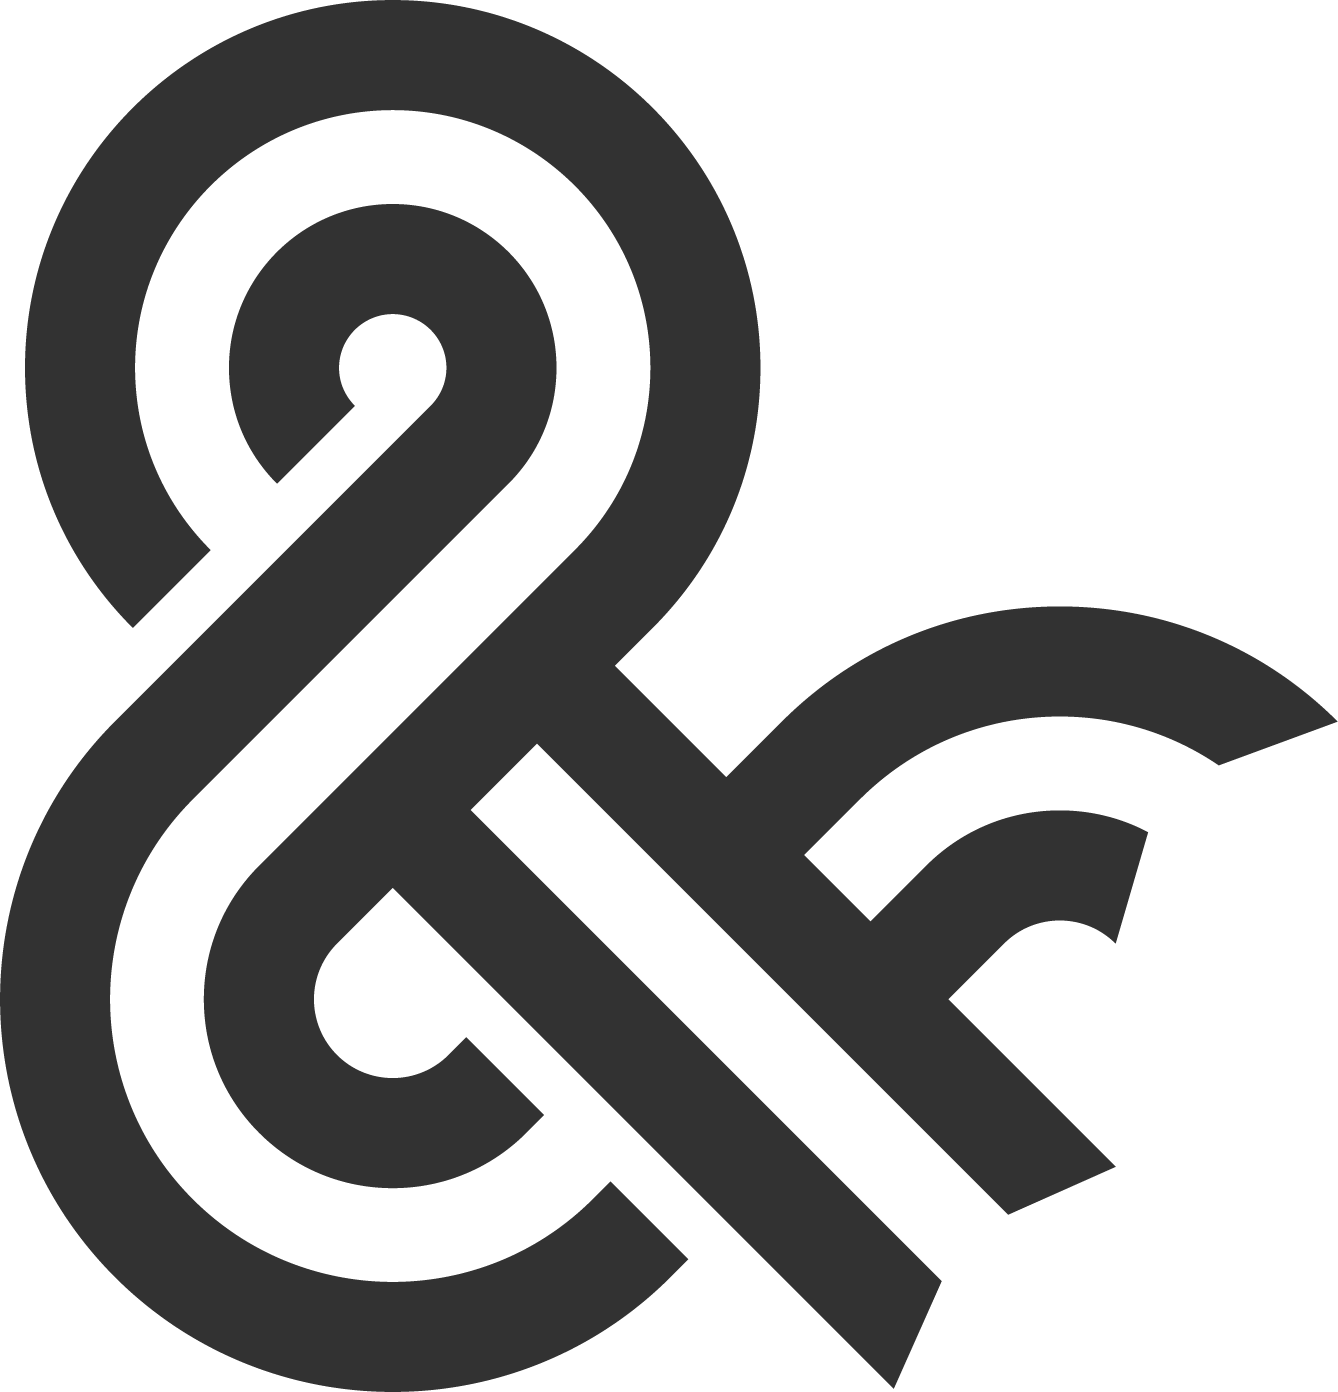 Ampersand_Logotype_Basic_Noir